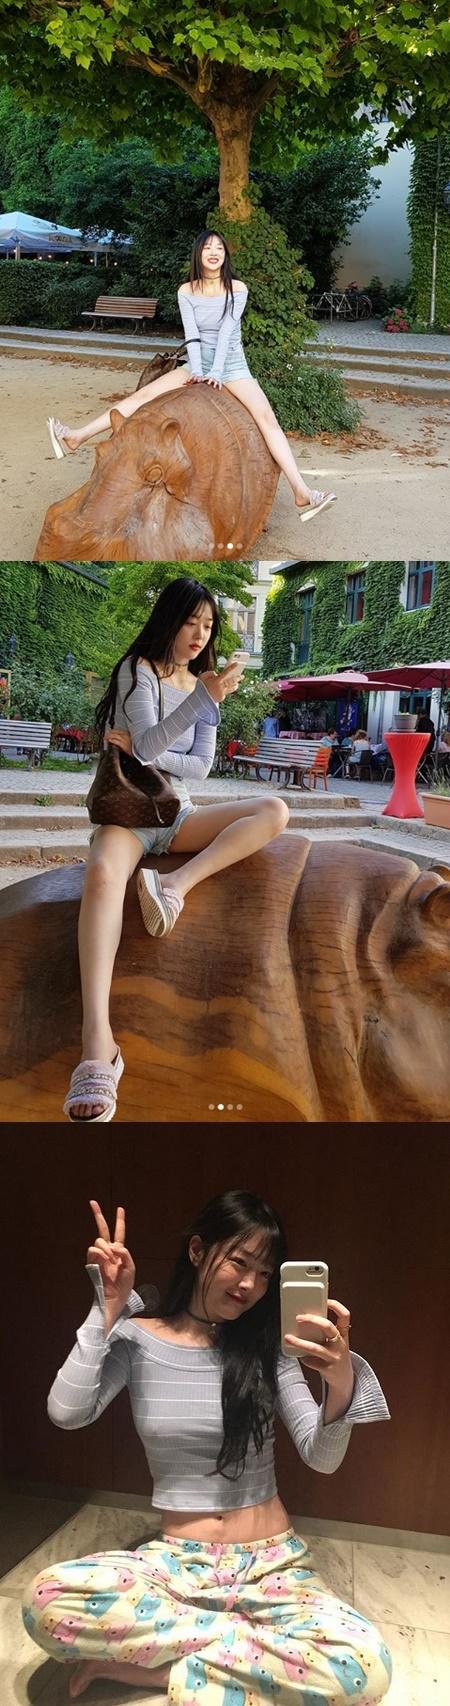 [★SNS] 설리, 관광지를 화보 촬영장으로 만드는 미모